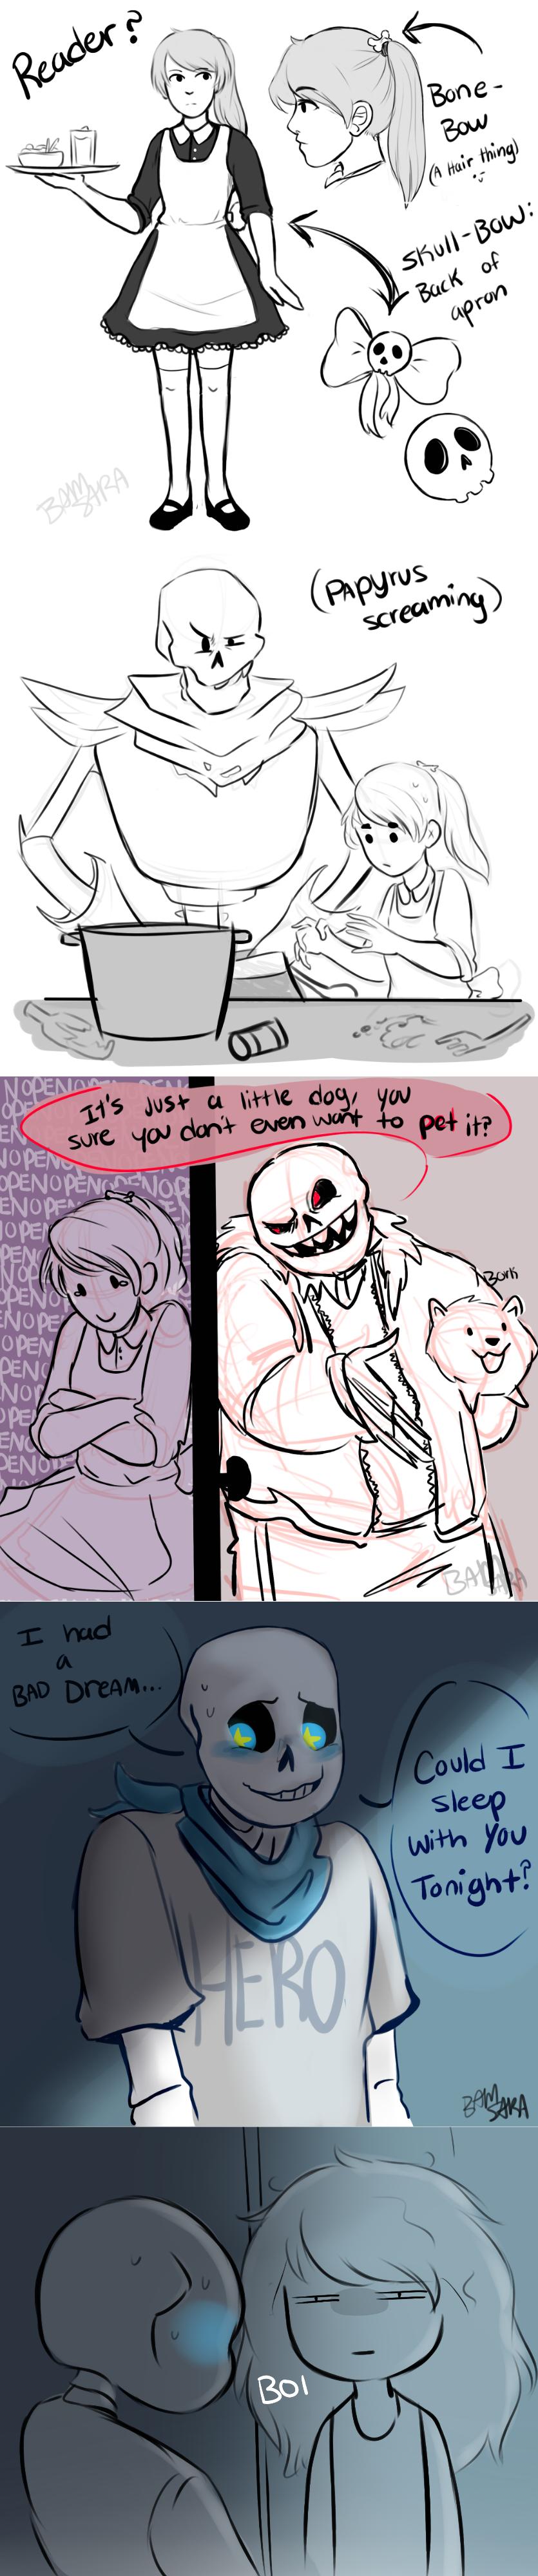 Six Skeletons, One Maid by BamSaraKilledYou